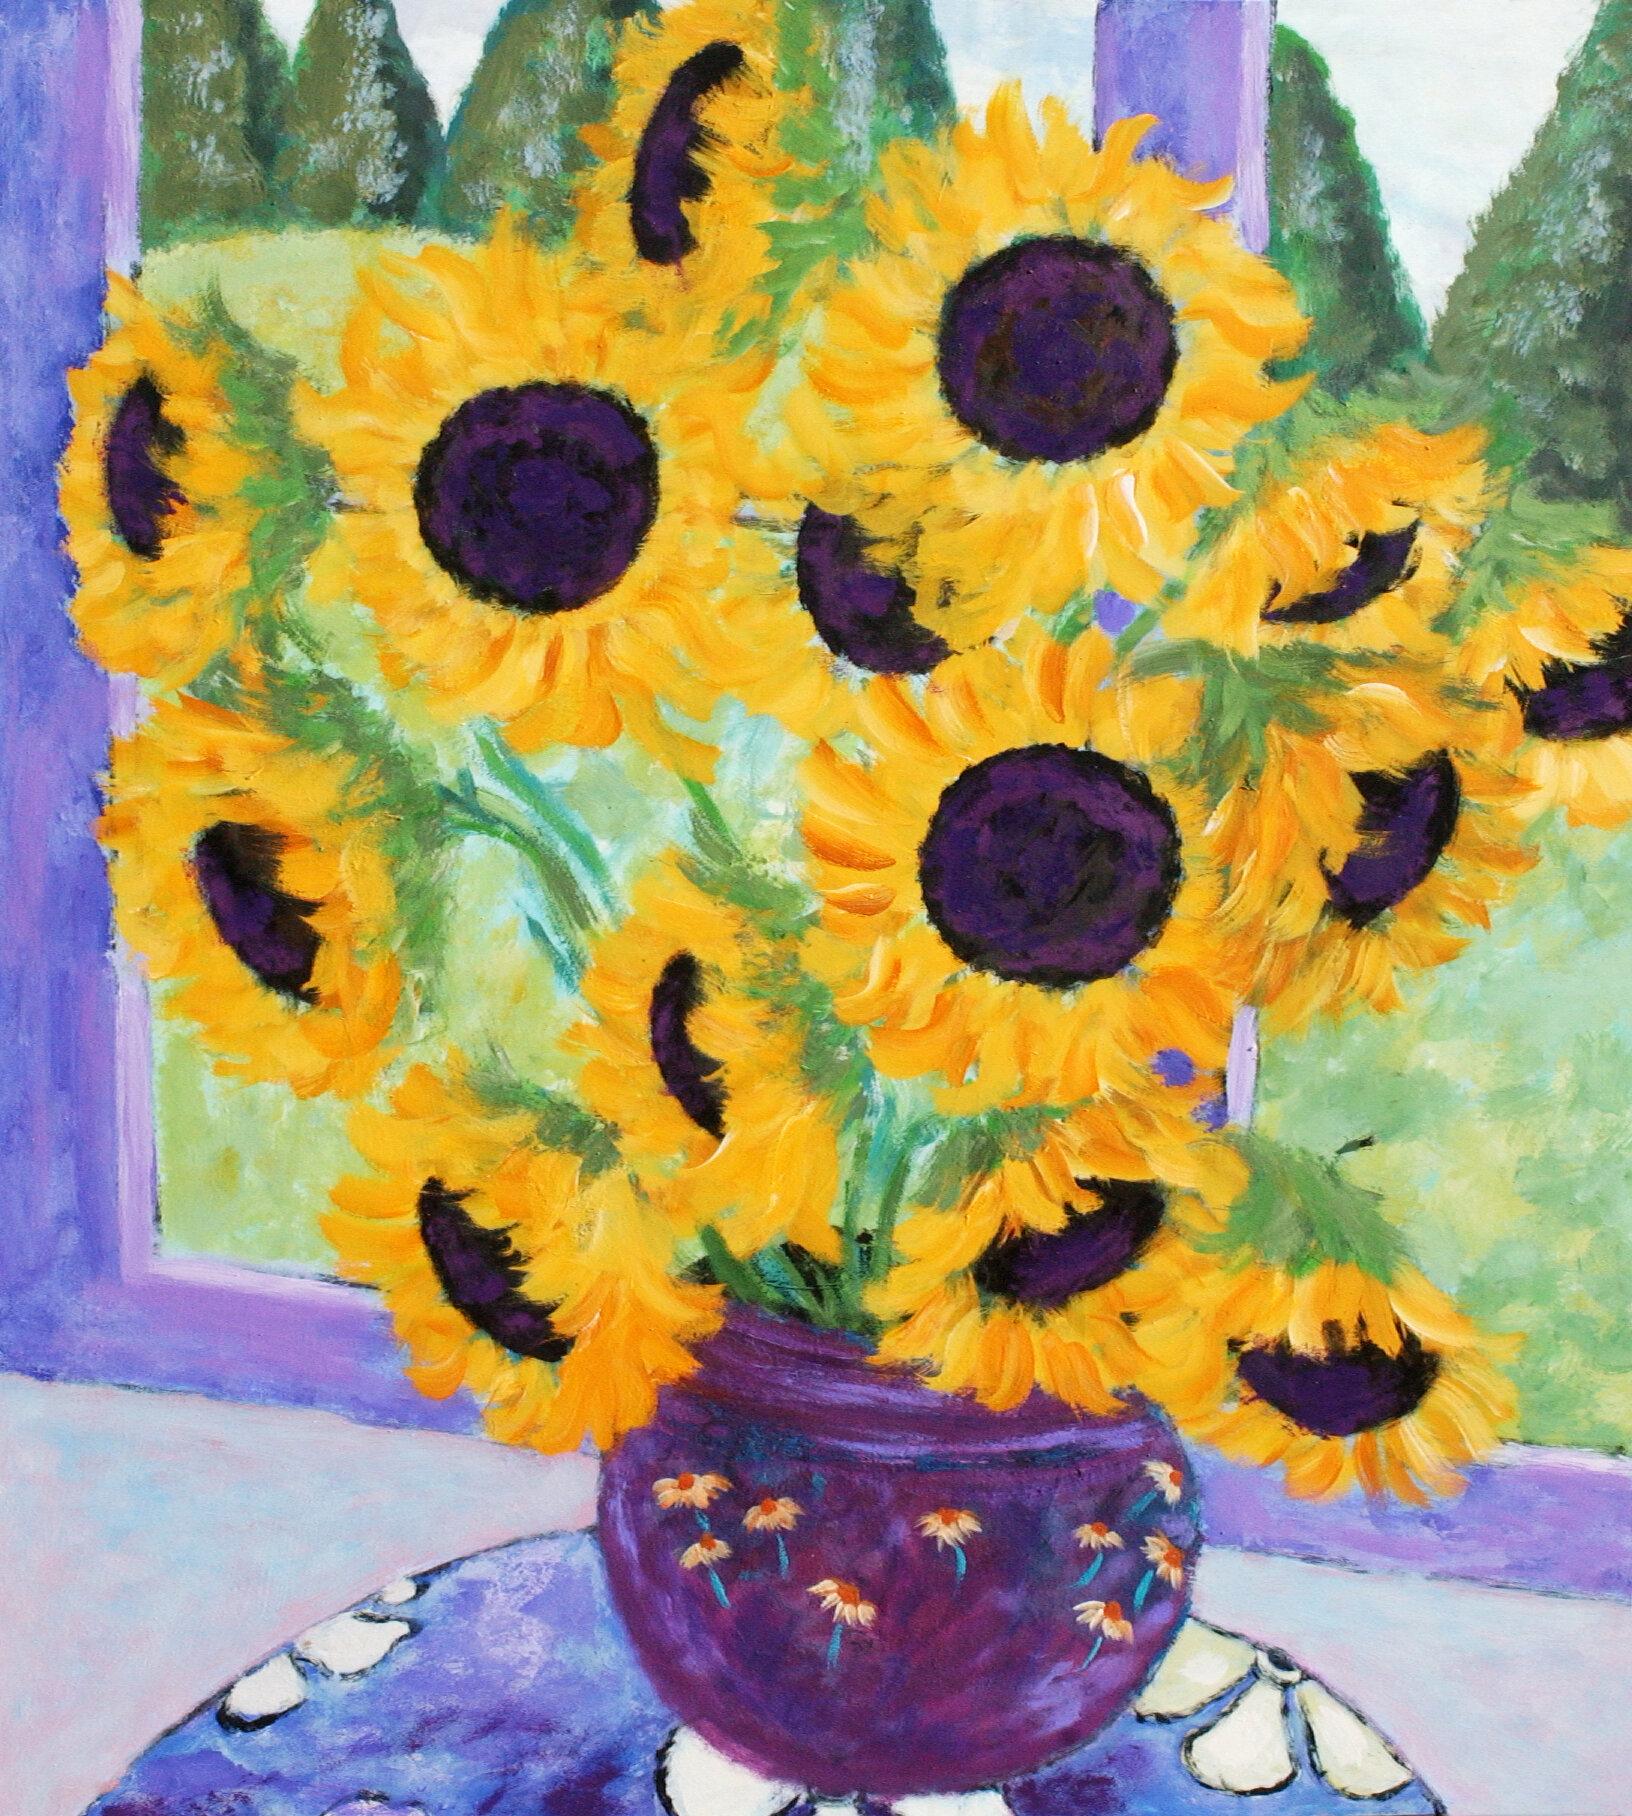 Buy Art For Less \'Sunflowers in the Window\' by Brendan Loughlin ...